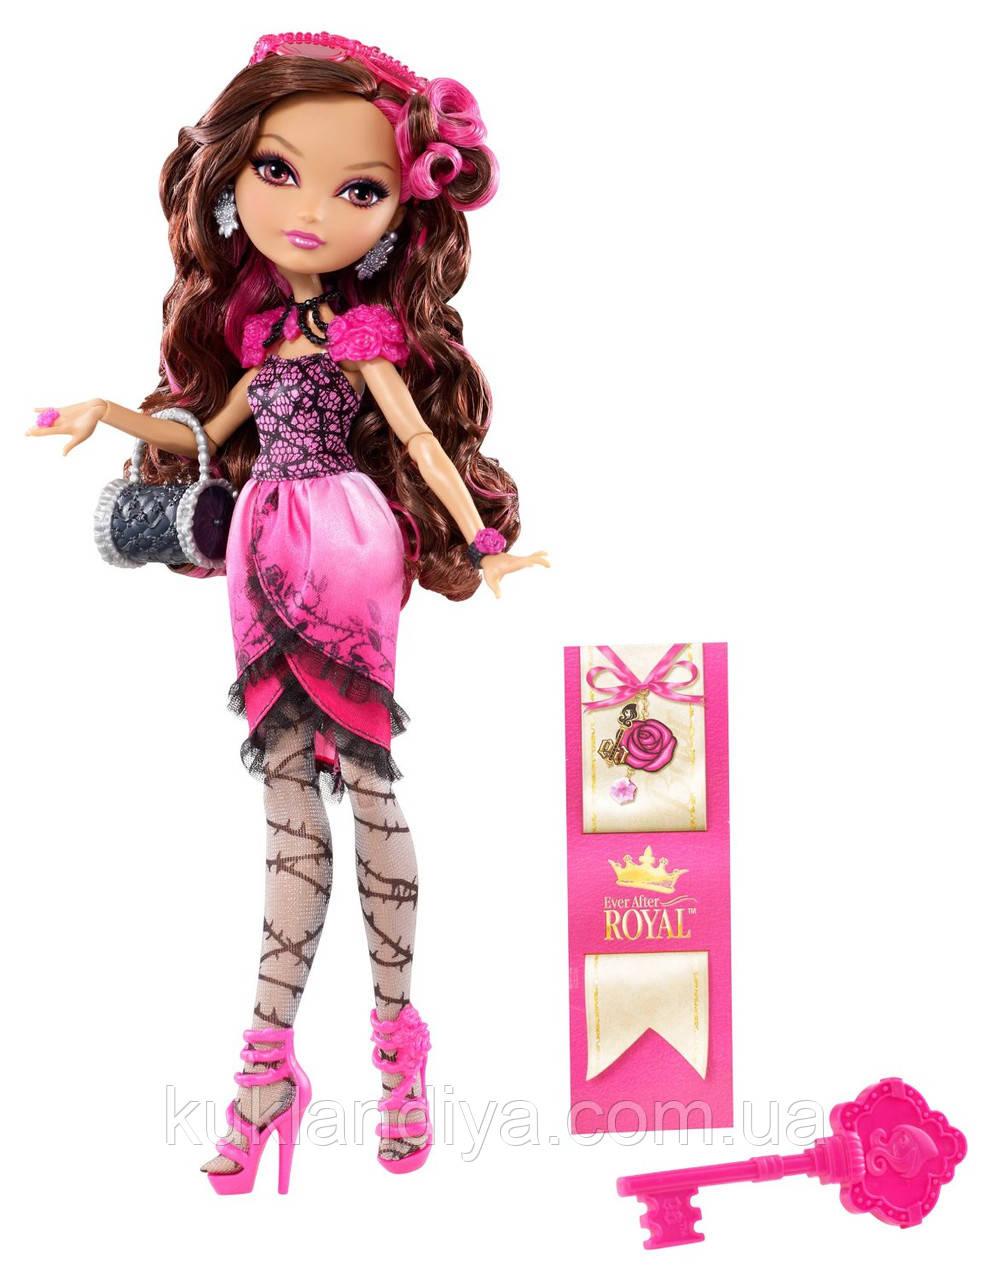 Кукла Ever After High  Briar Beauty Браер Бьюти Базовая